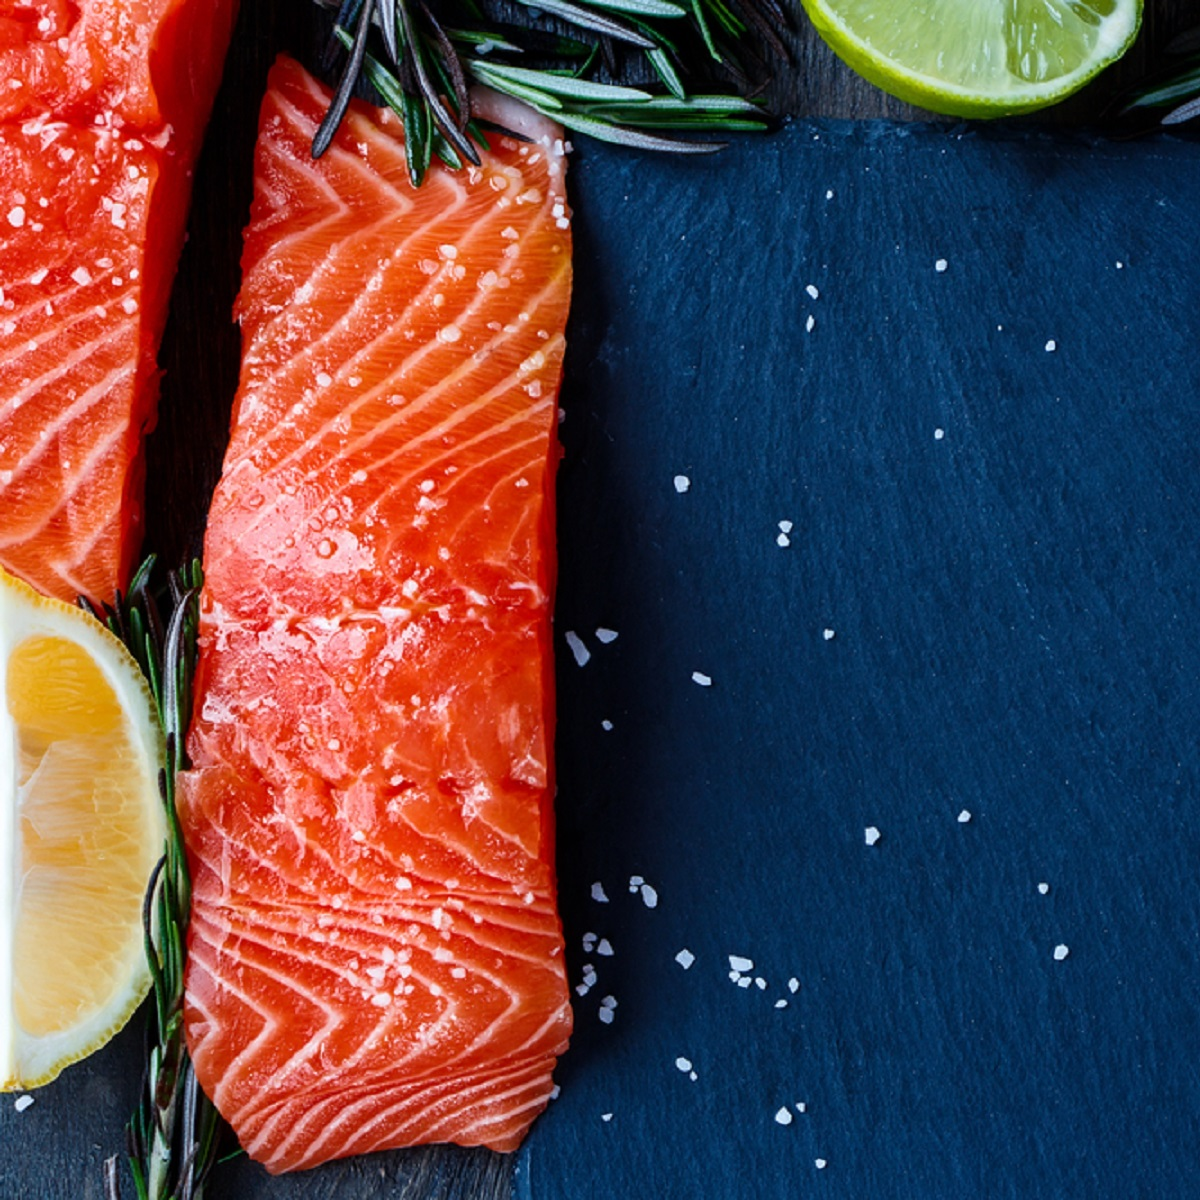 OMEGA-3 FATTY ACIDS – The Amazing 23 Health Benefits of Omega-3 Fatty Acids Based on Science